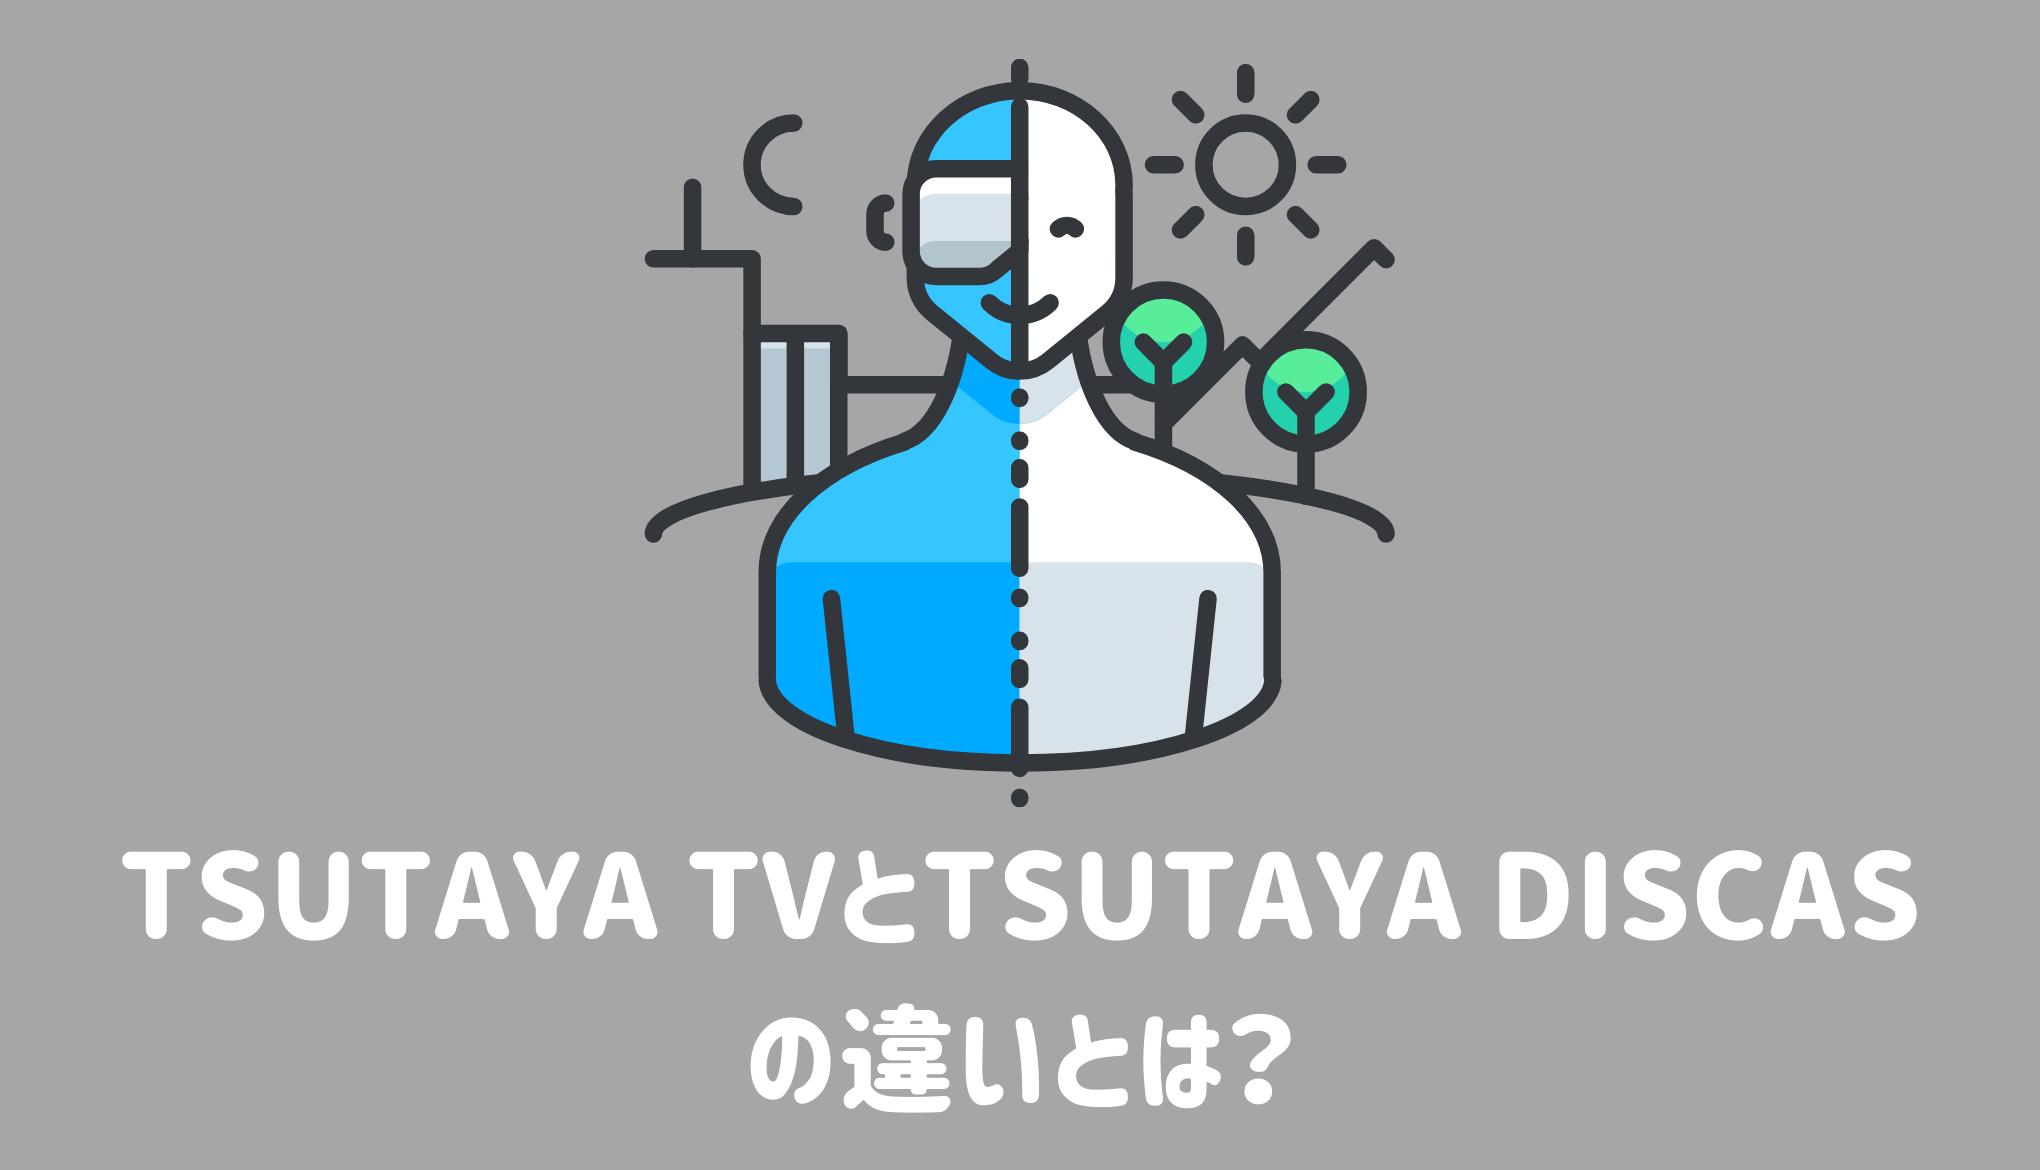 TSUTAYA TVとTSUTAYA DISCASの違い